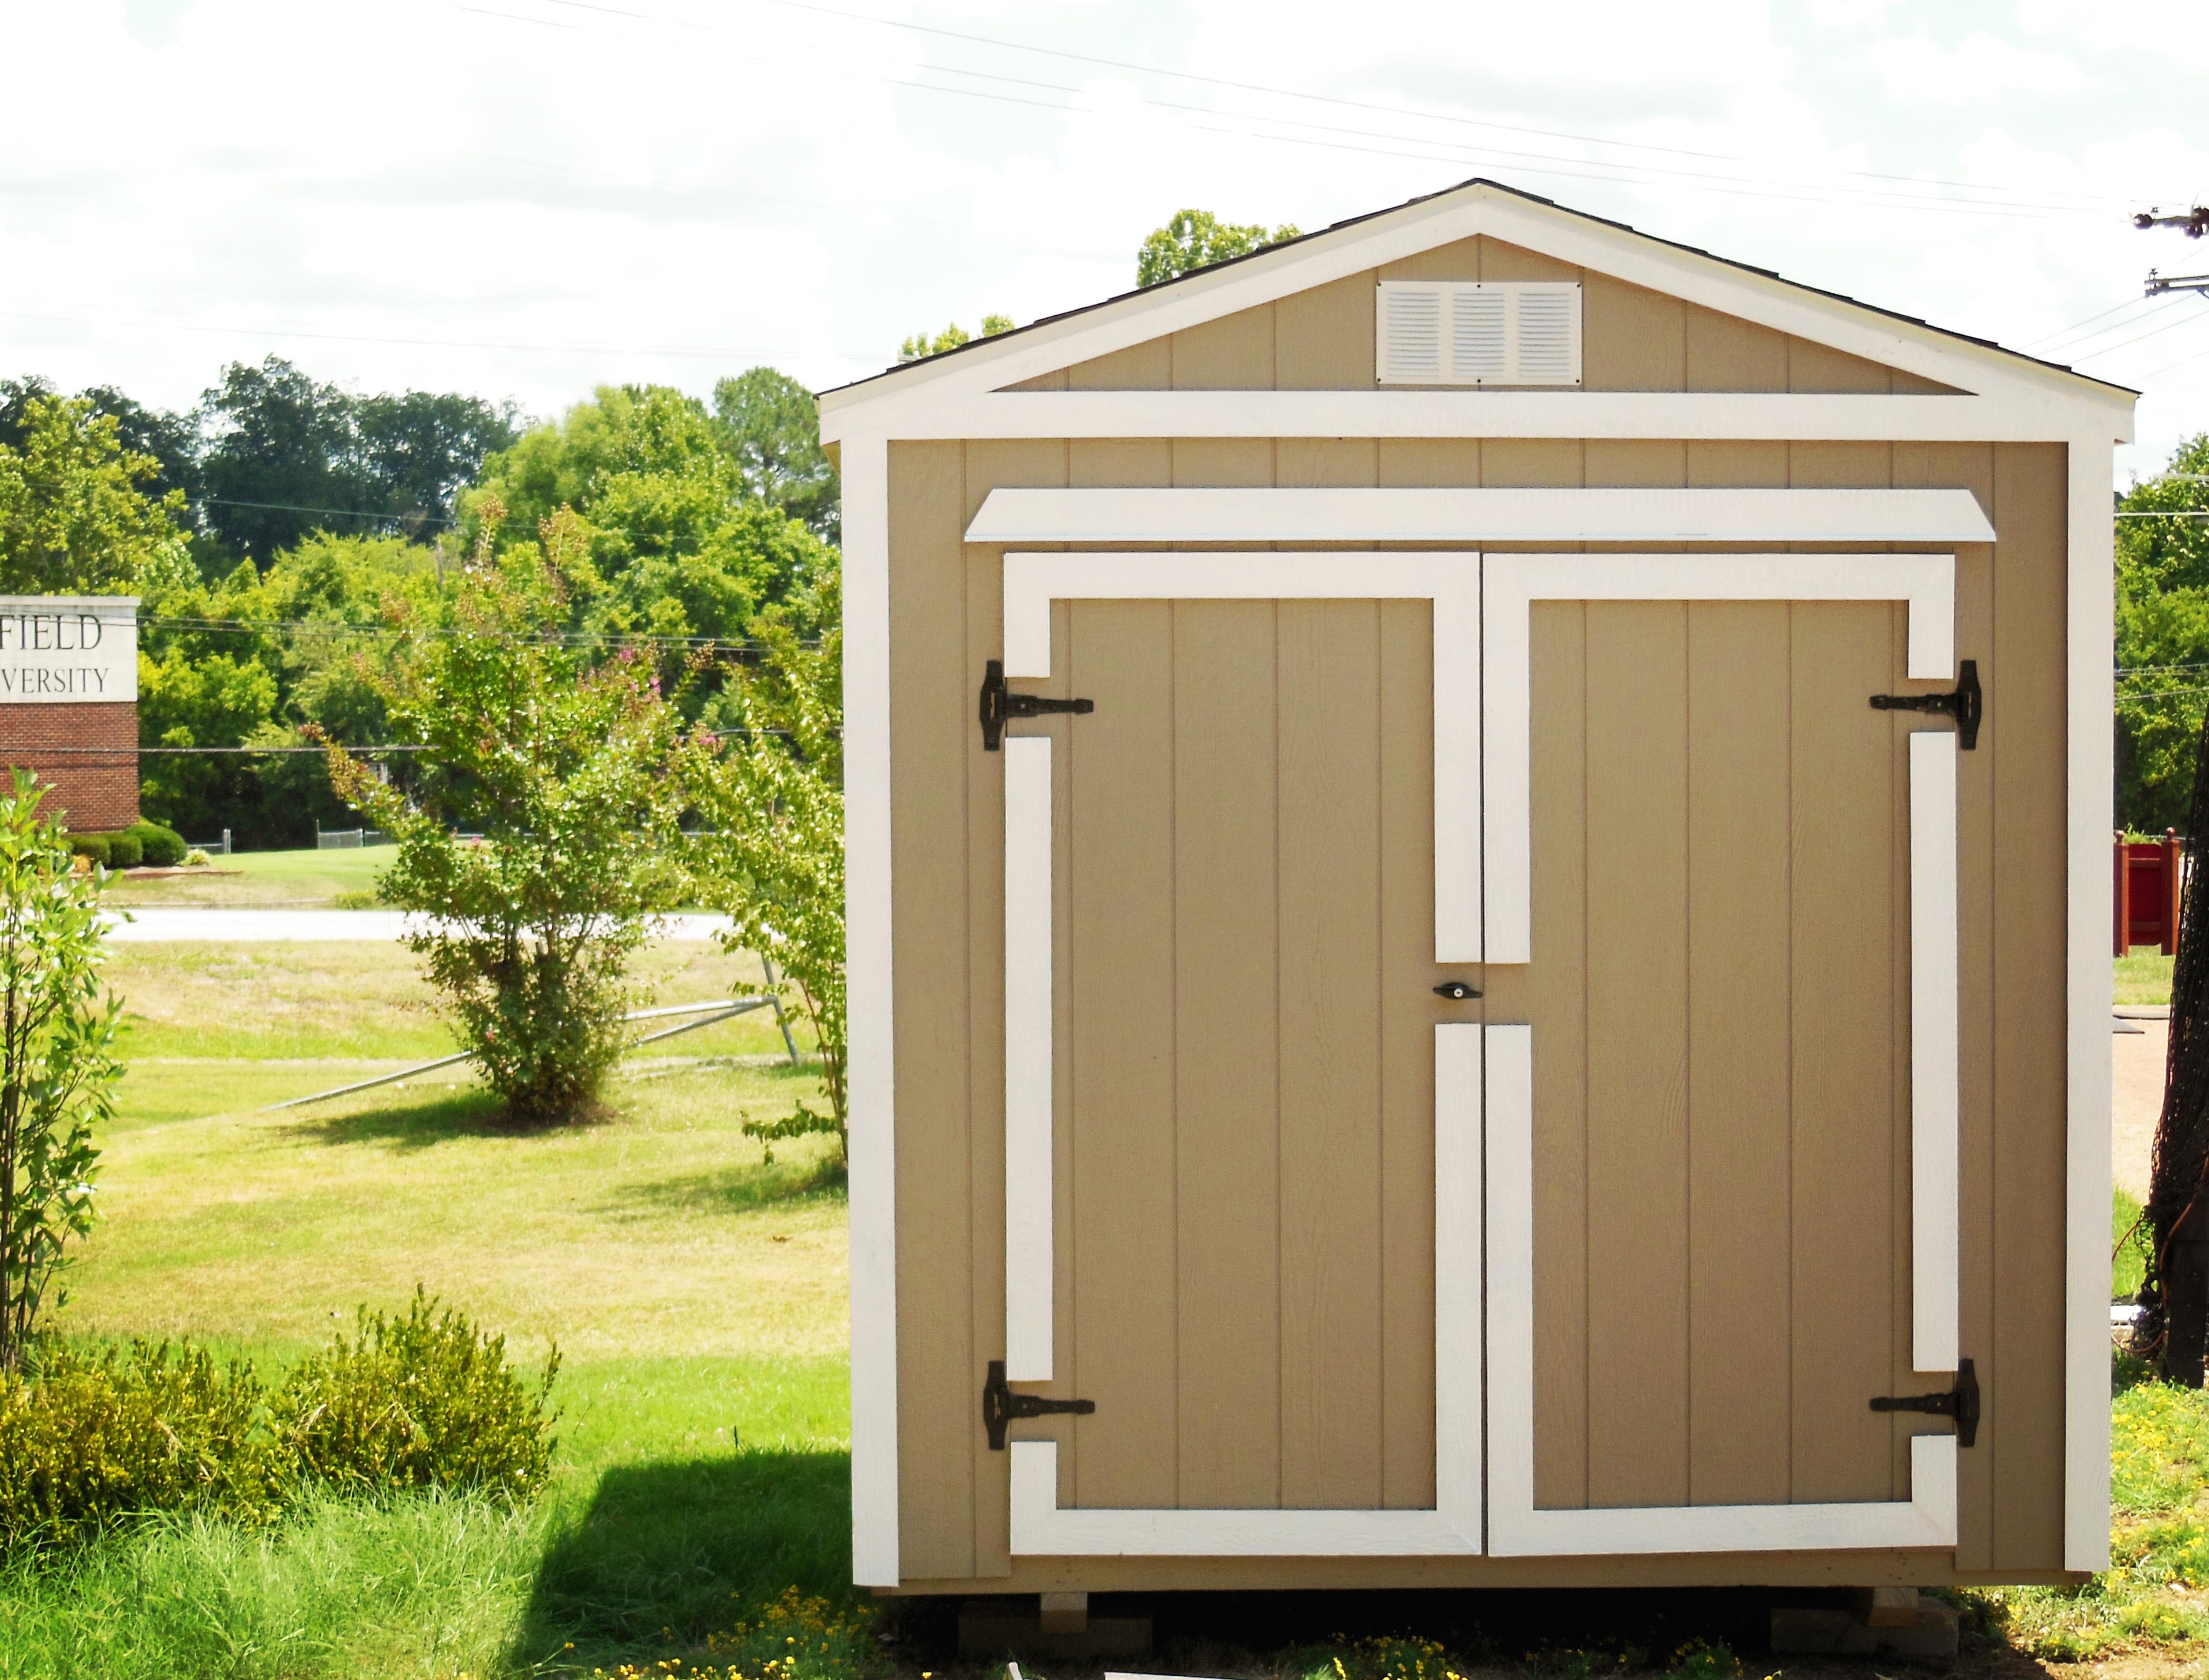 Corporate Storage Buildings / Corporate Storage Sheds